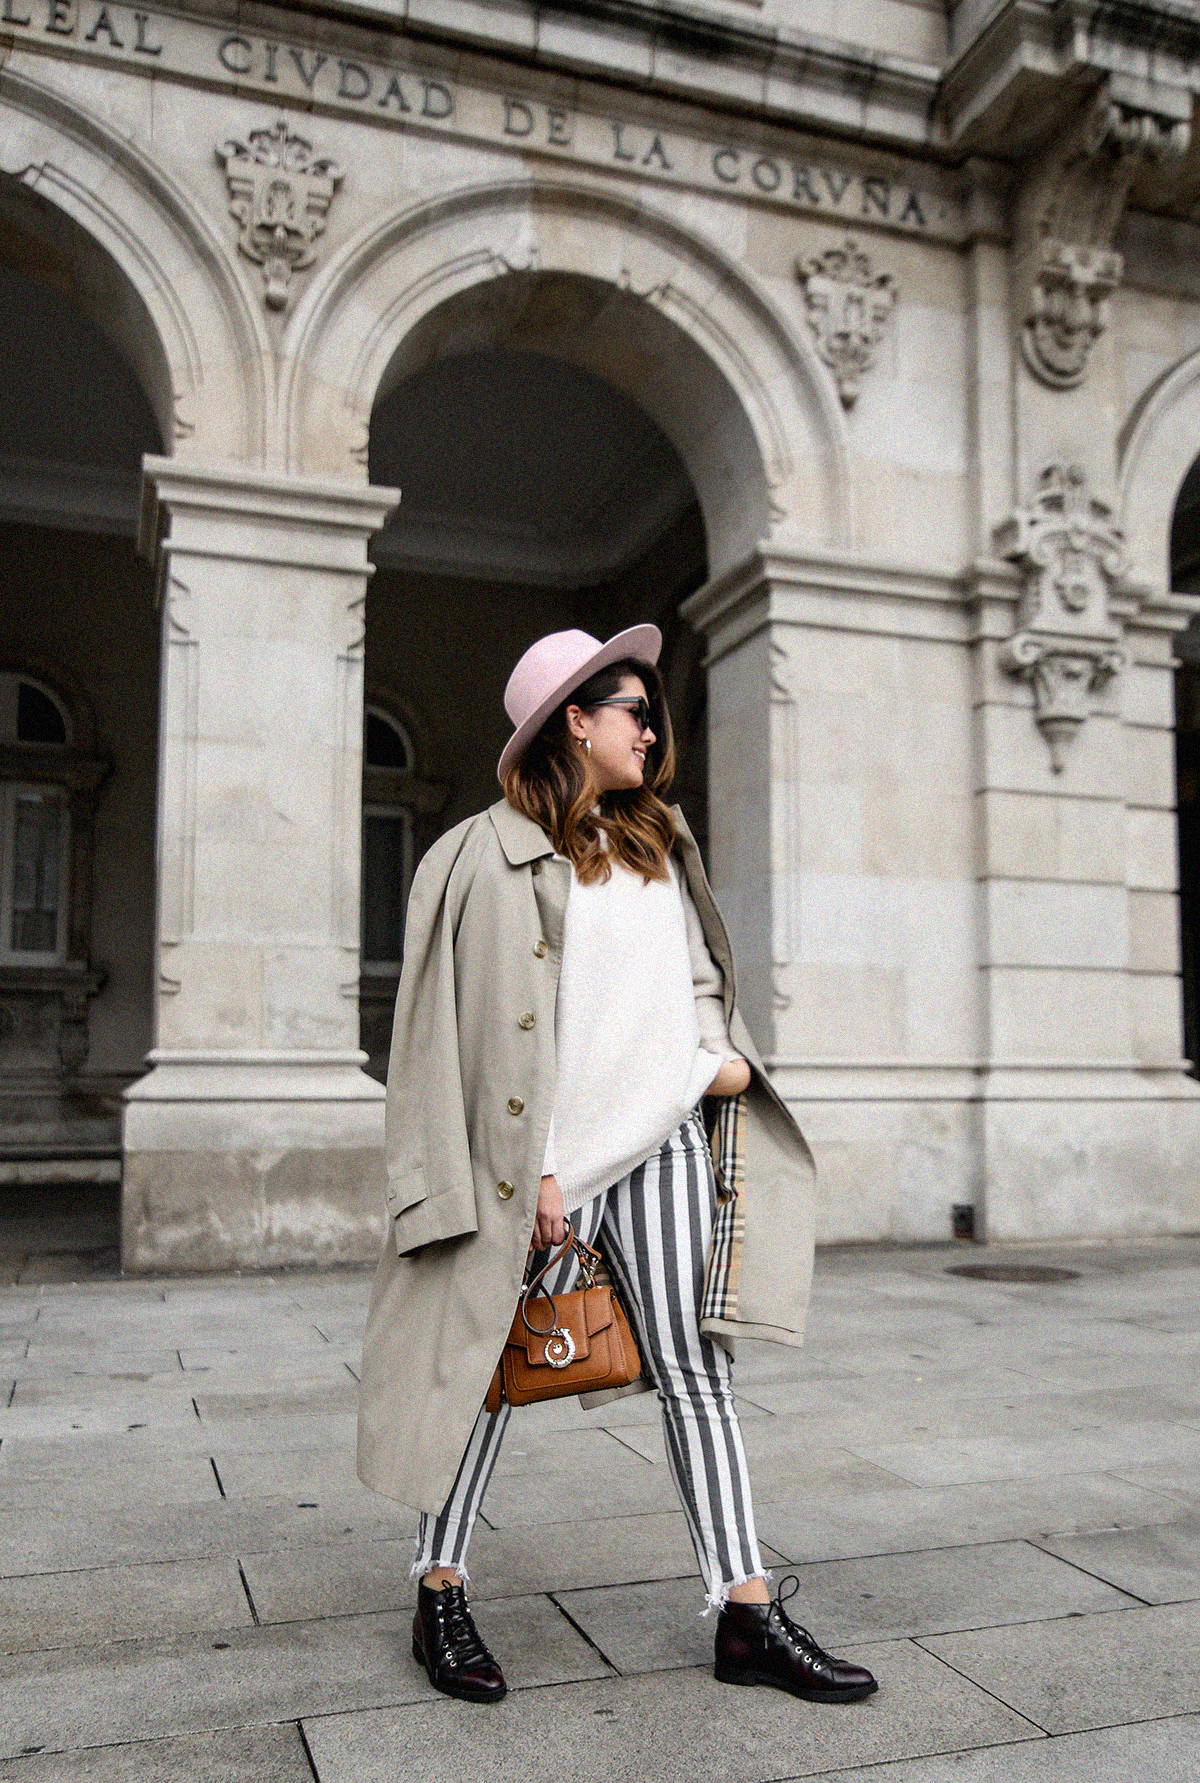 pantalones-de-rayas-pull&bear-streetstyle-lovy-bag-trussardi13